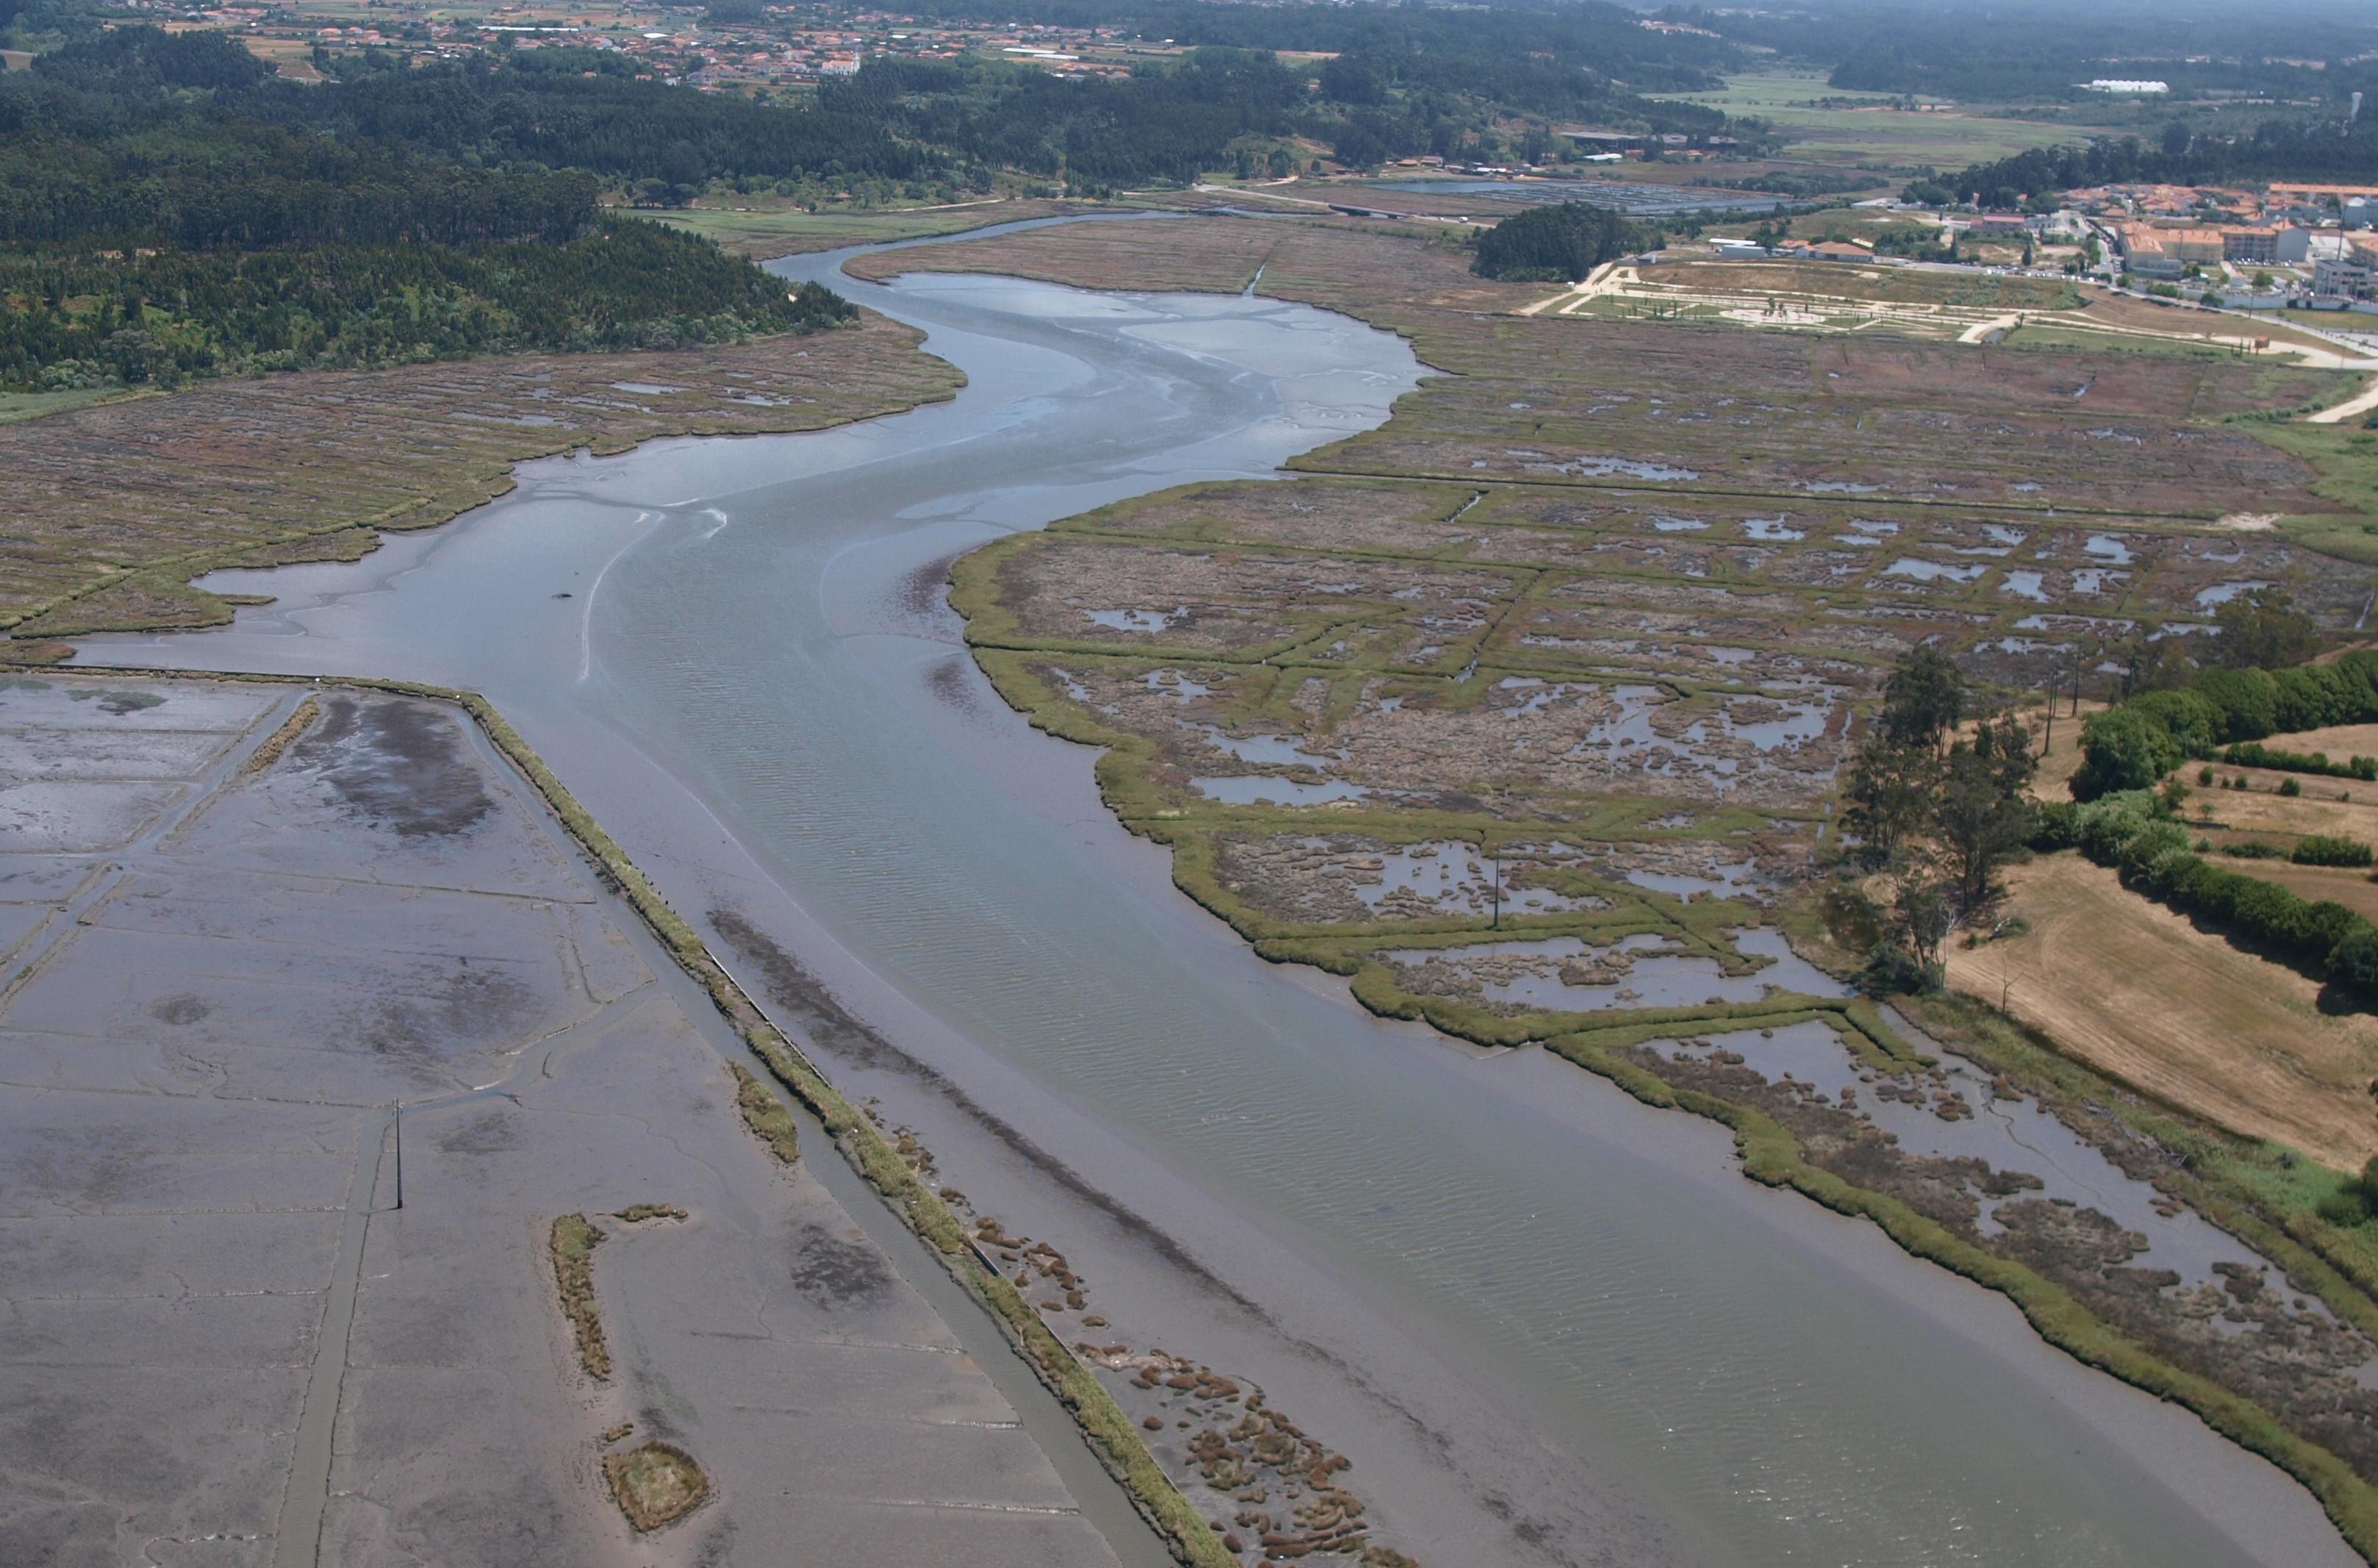 Ria de Aveiro - Rio Boco (Canal de Ílhavo)